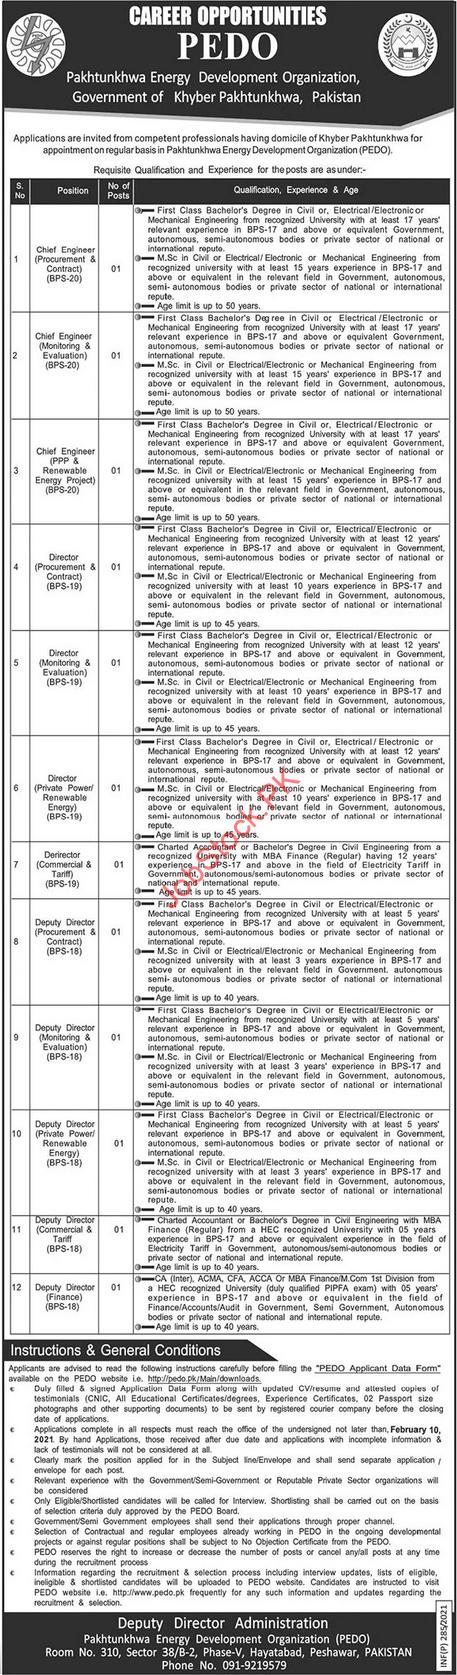 Pakhtunkhwa Energy Development Organization Pedo Peshawar Jobs 2021 Latest